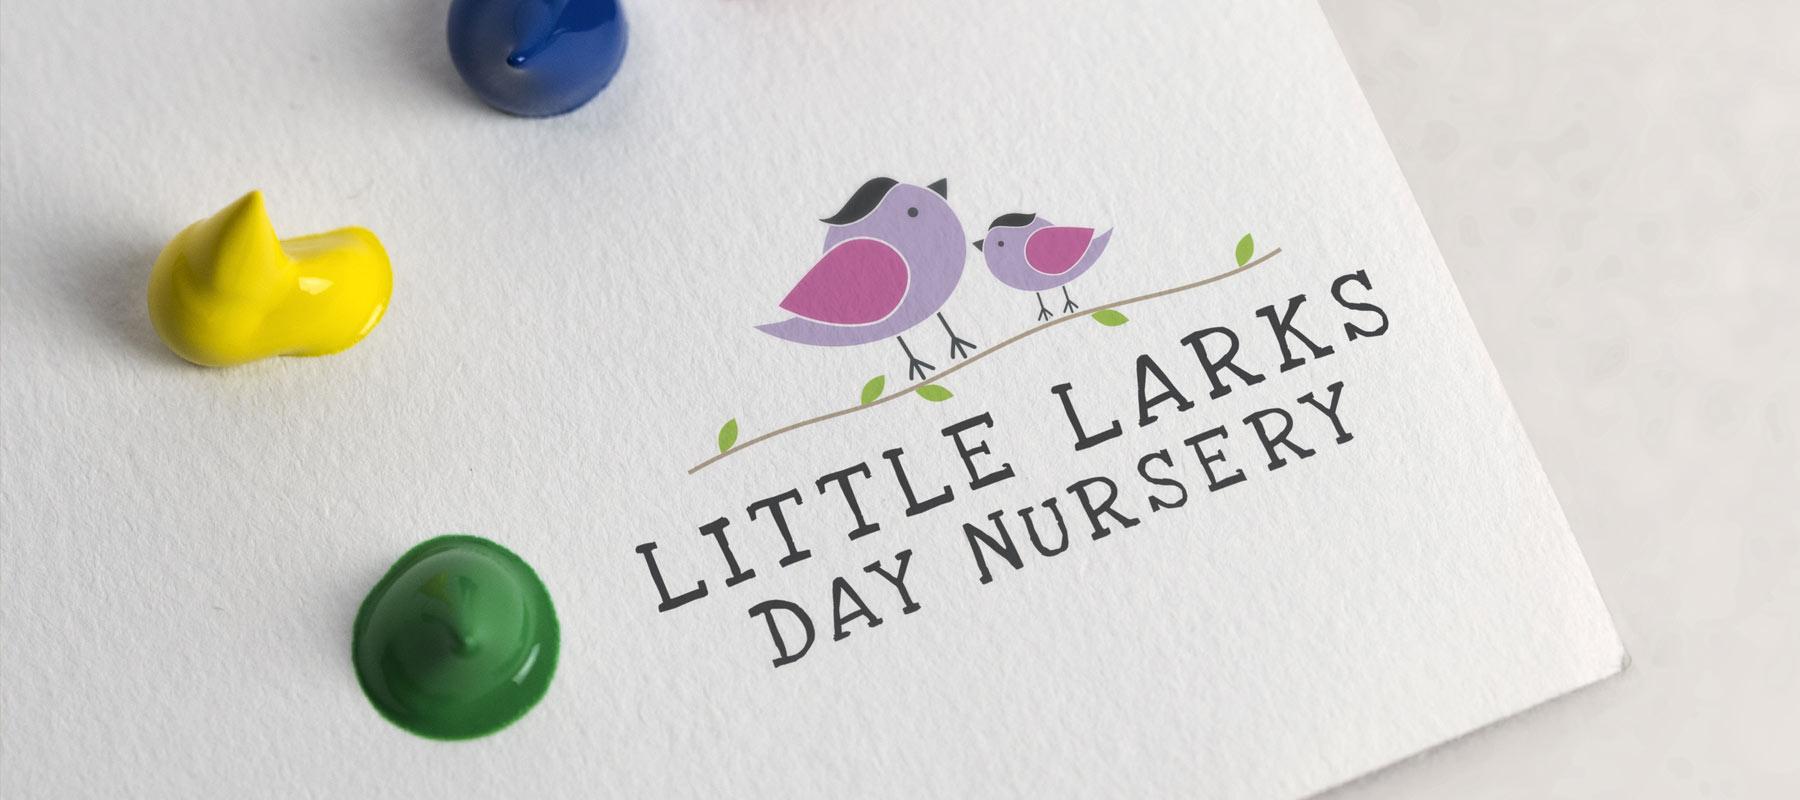 Little Larks Day Nursery - Logo Design - Sudbury, Suffolk, Bury St Edmunds